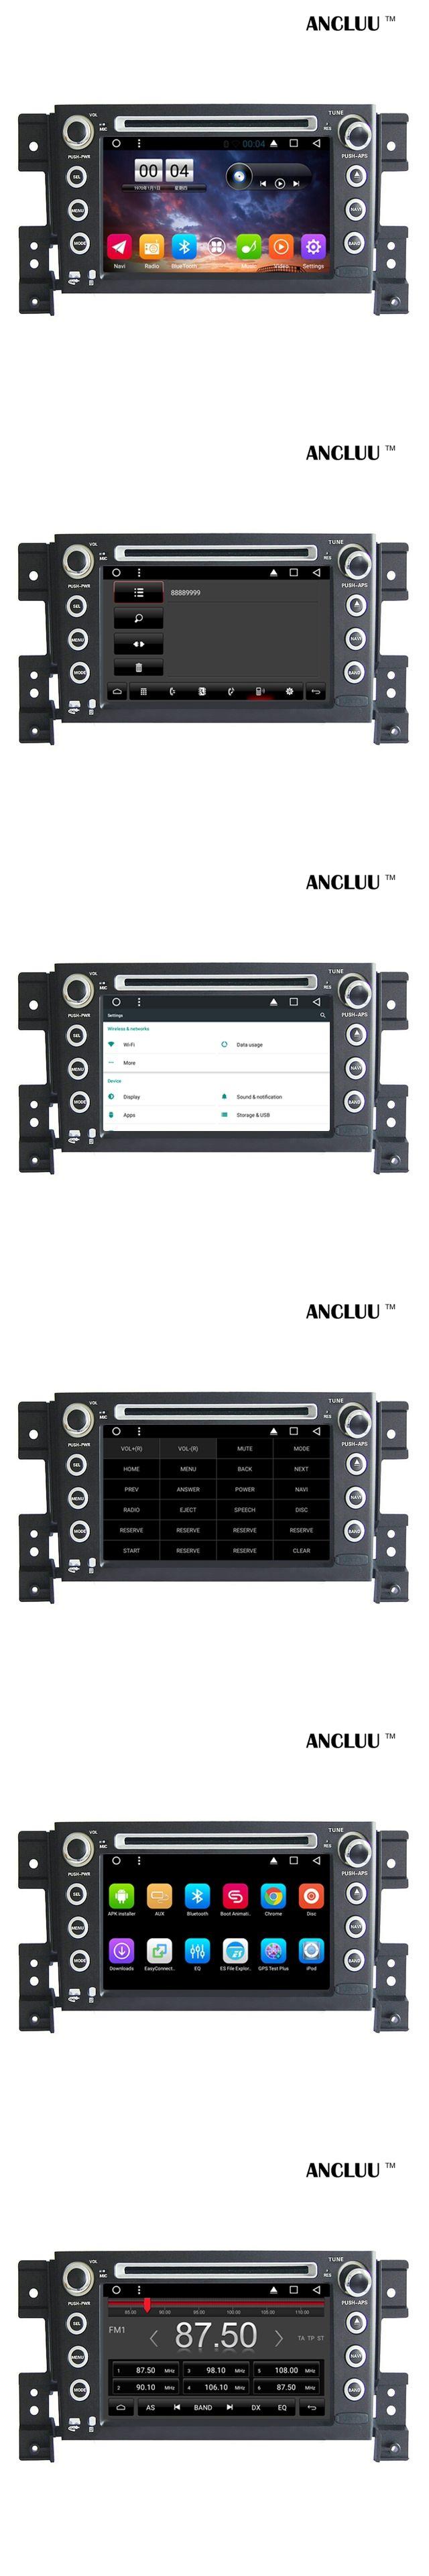 "2 DIN 7"" Android 5.1 Car DVD in dash for Suzuki Grand Vitara 2005-2009 2010 2011 2012 Car Radio GPS SD USB 3g WIFI 1080P"